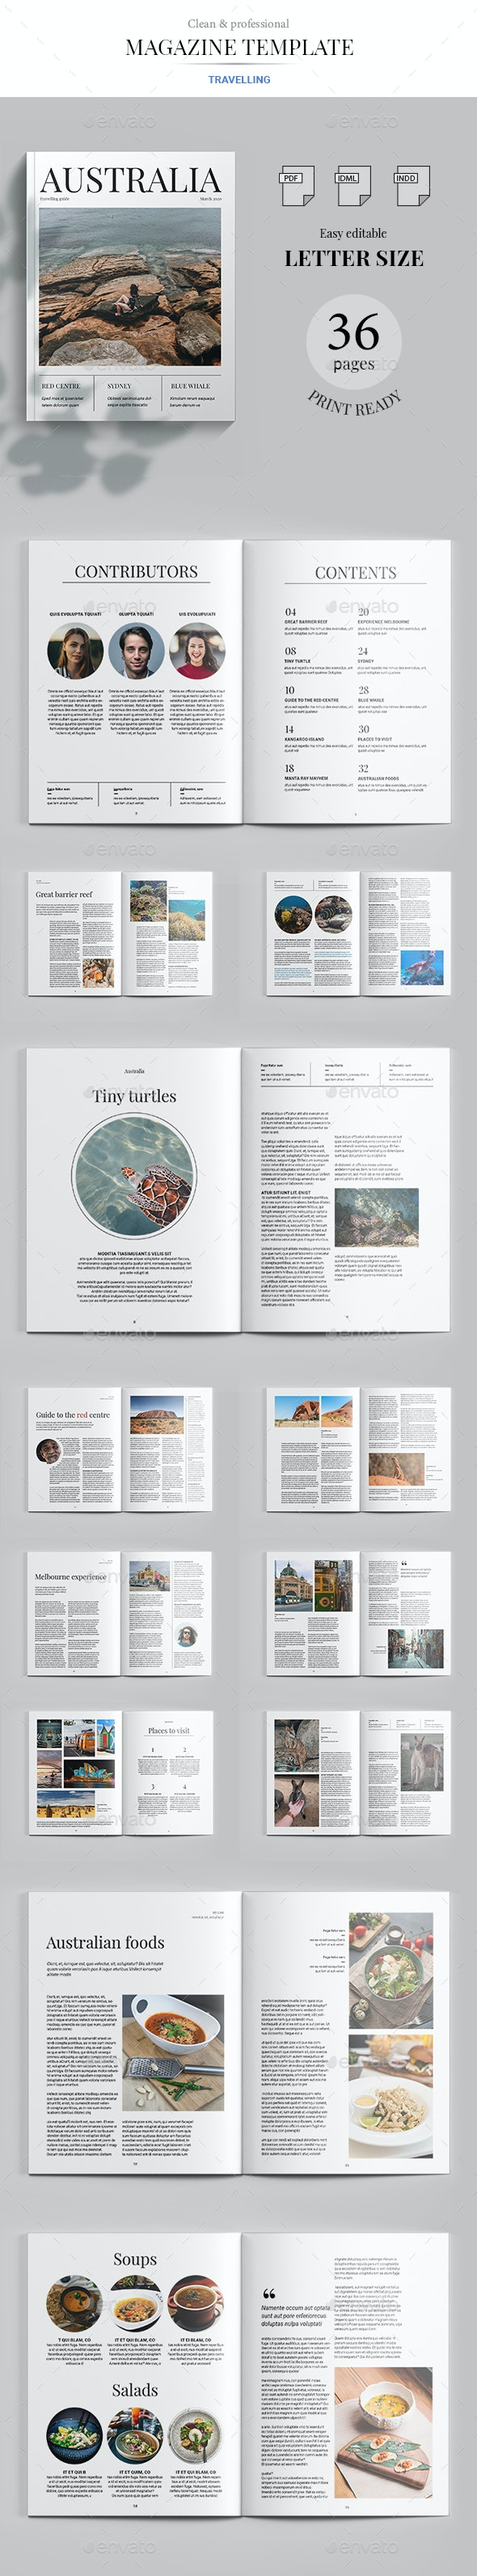 Australia Magazin Template - Magazines Print Templates